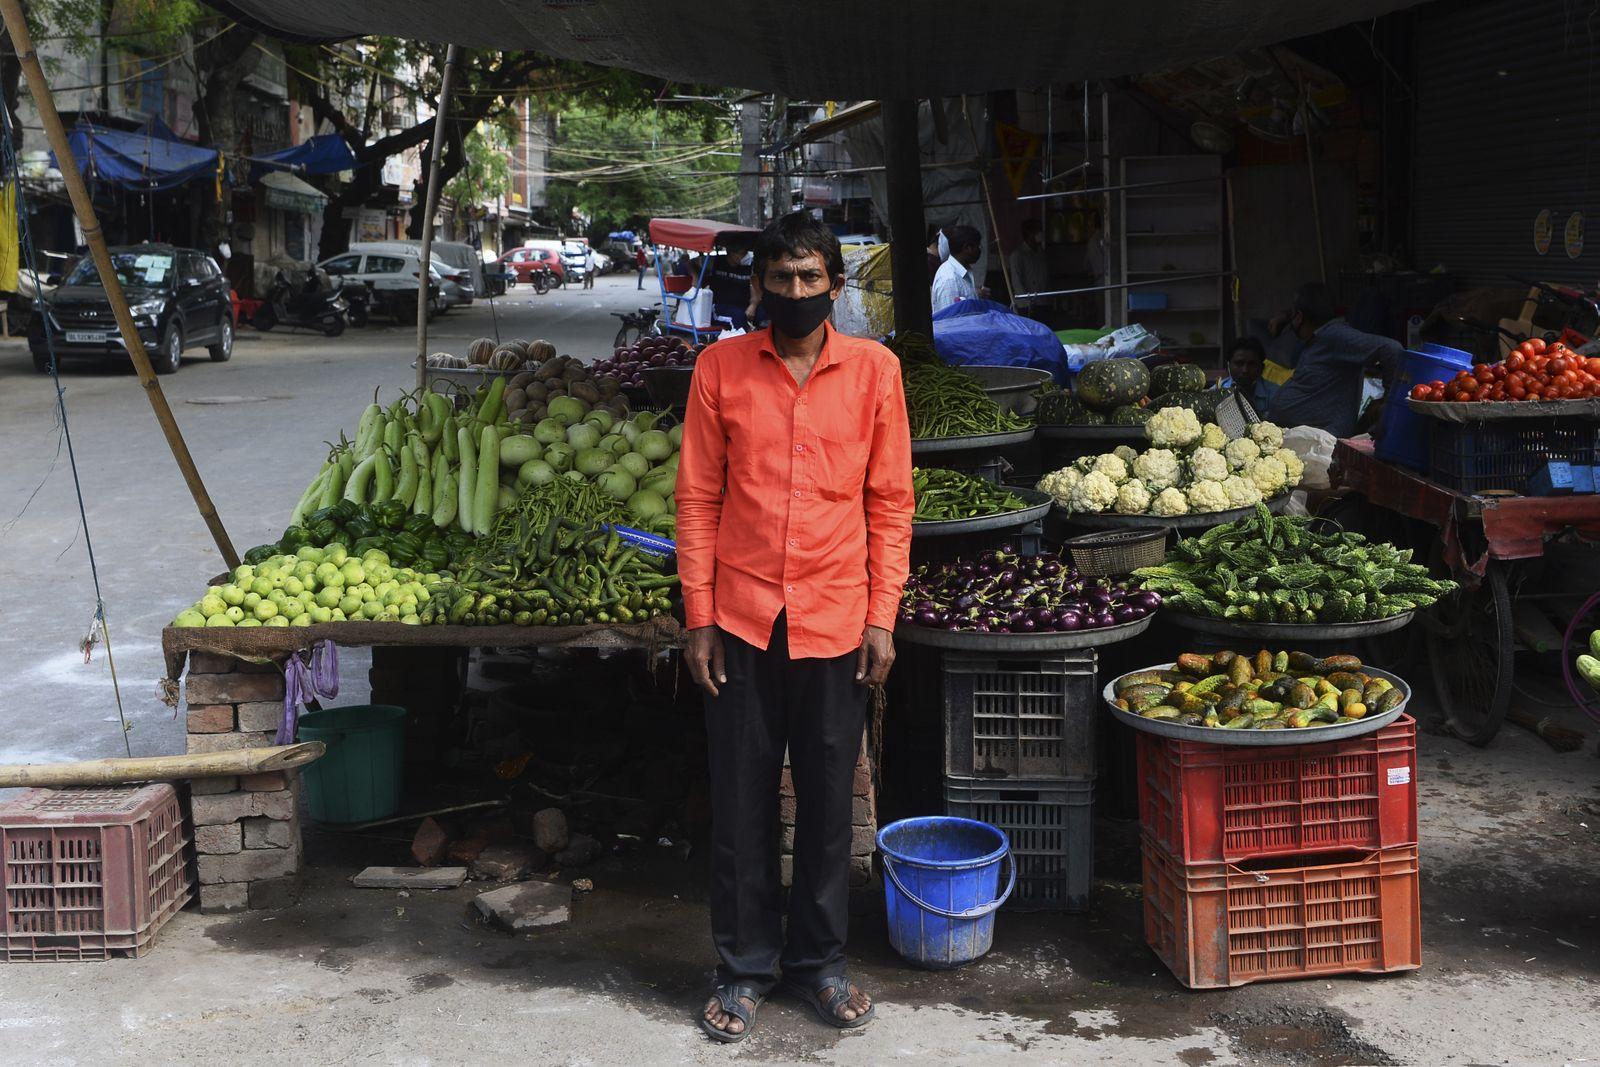 INDIA-HEALTH-VIRUS-MAYDAY-PHOTO ESSAY